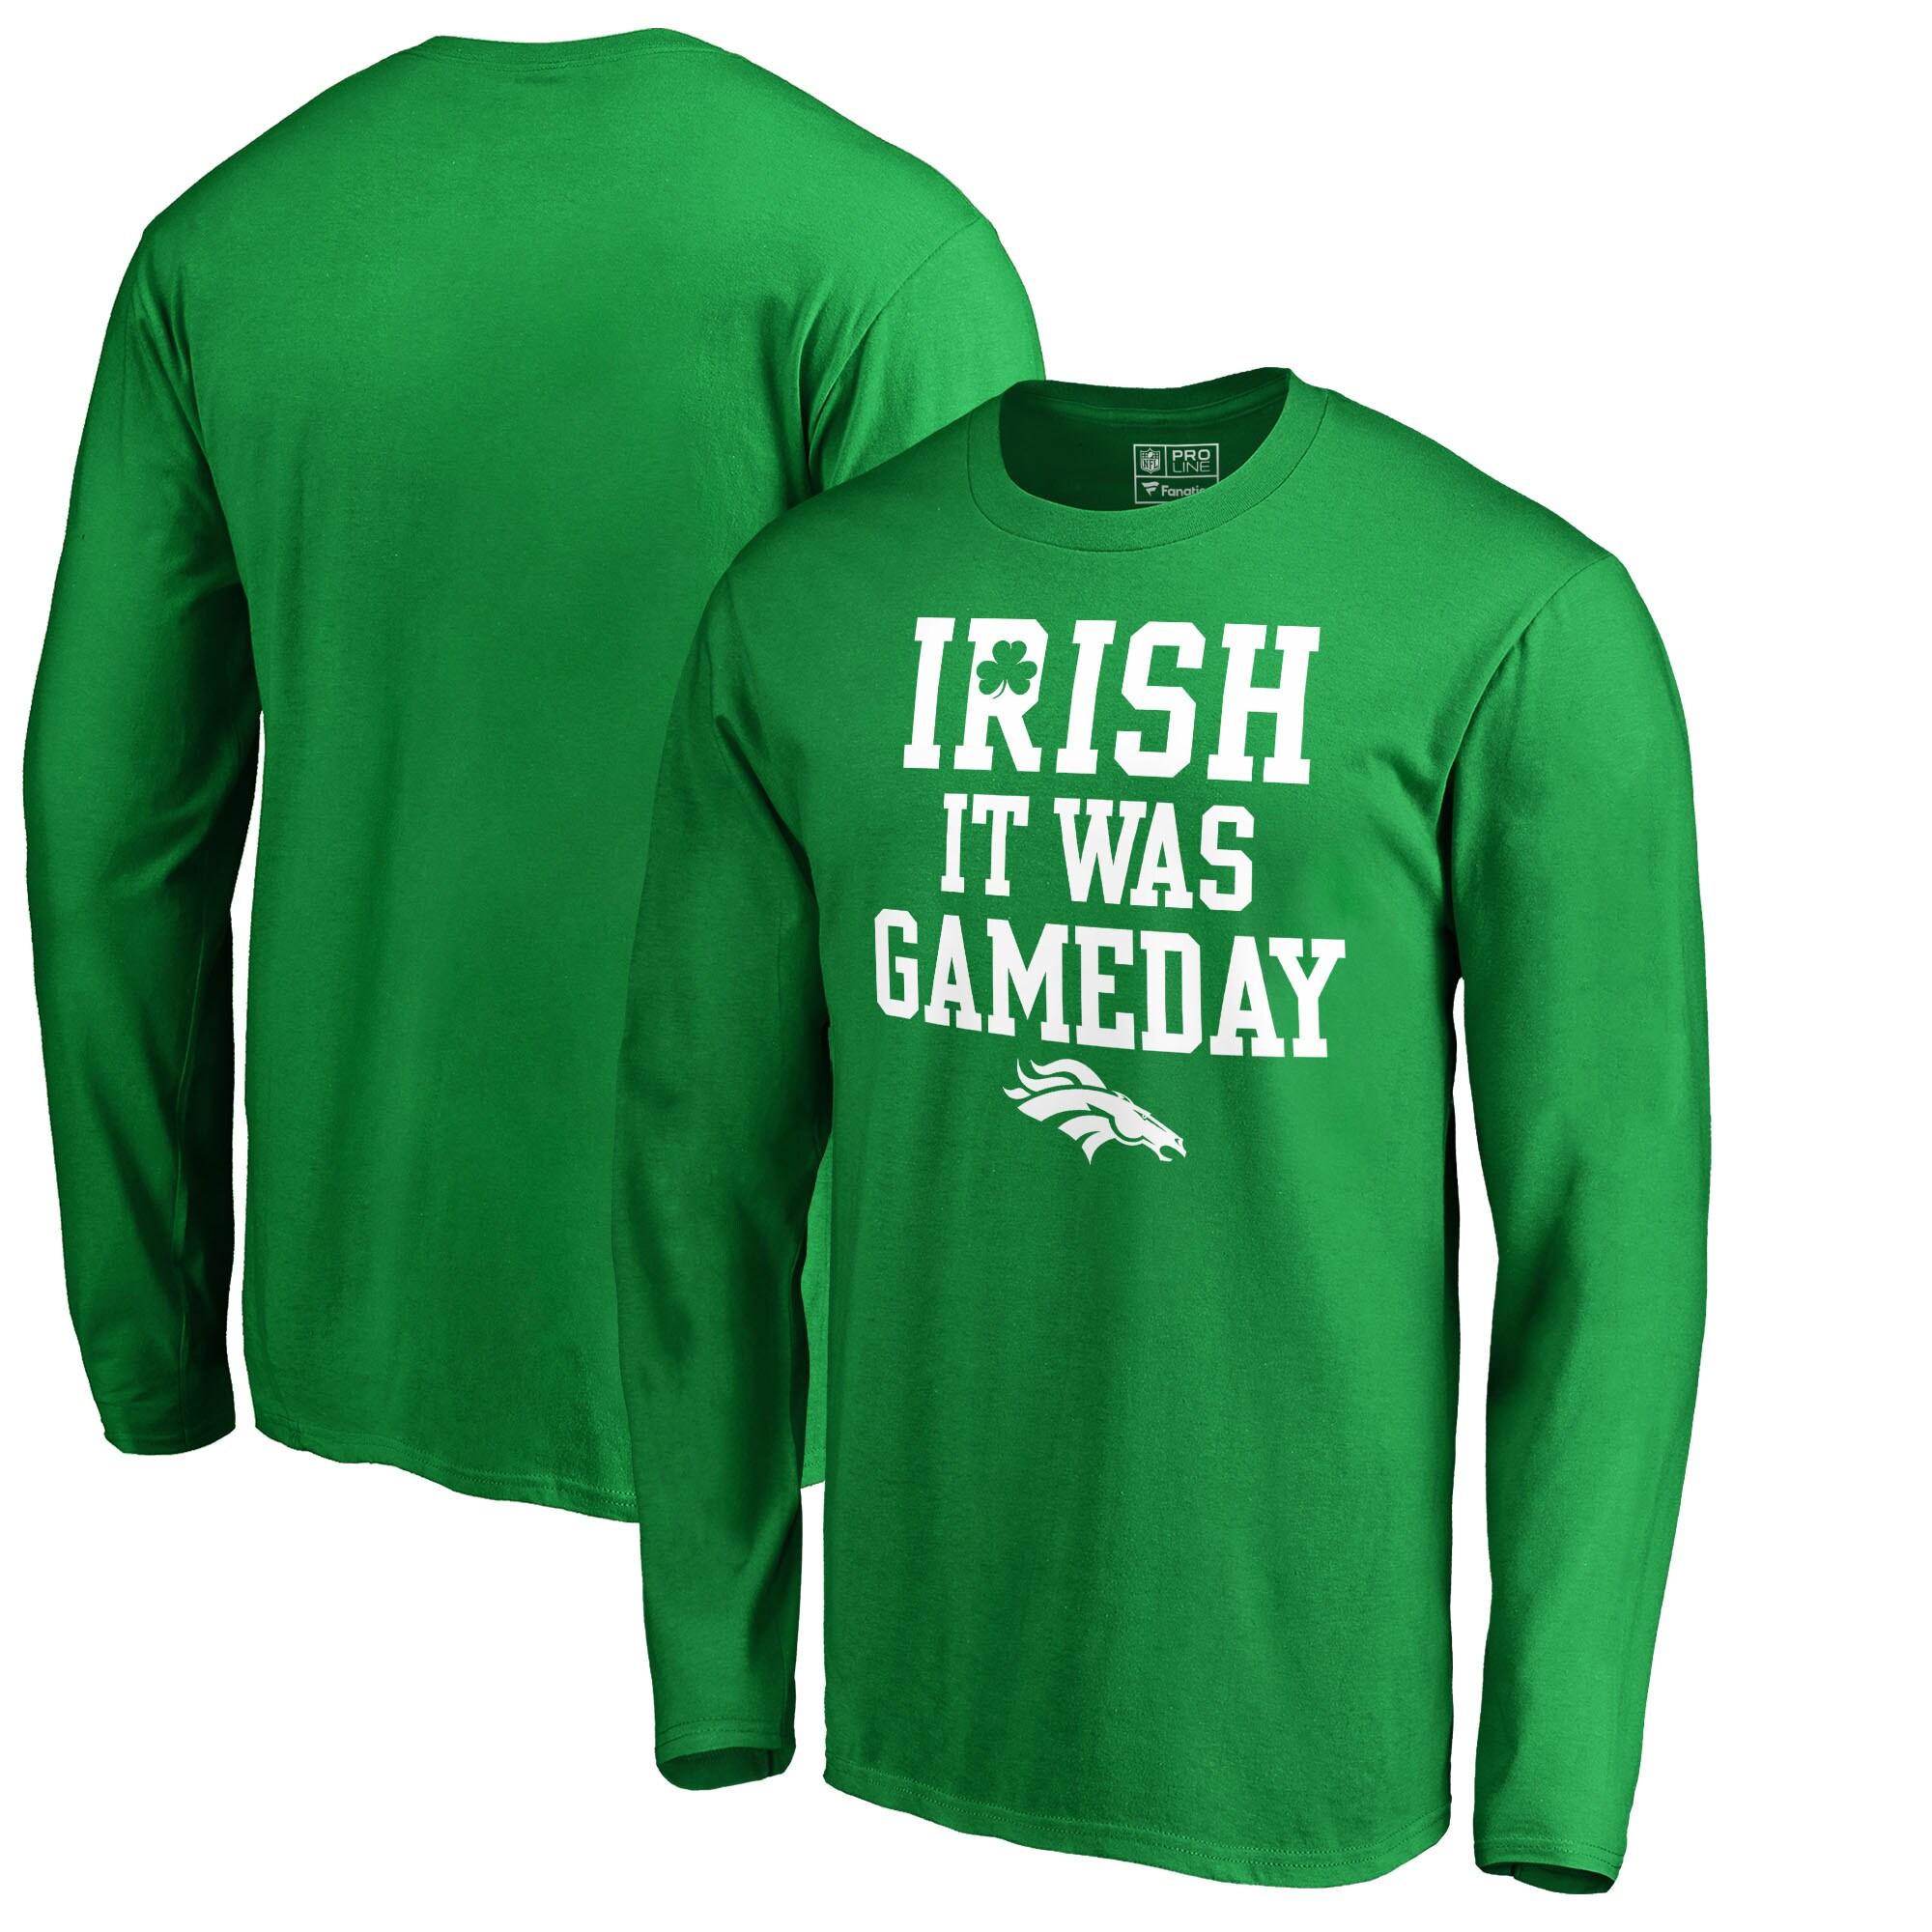 Denver Broncos NFL Pro Line by Fanatics Branded Irish Gameday Long Sleeve T-Shirt - Kelly Green